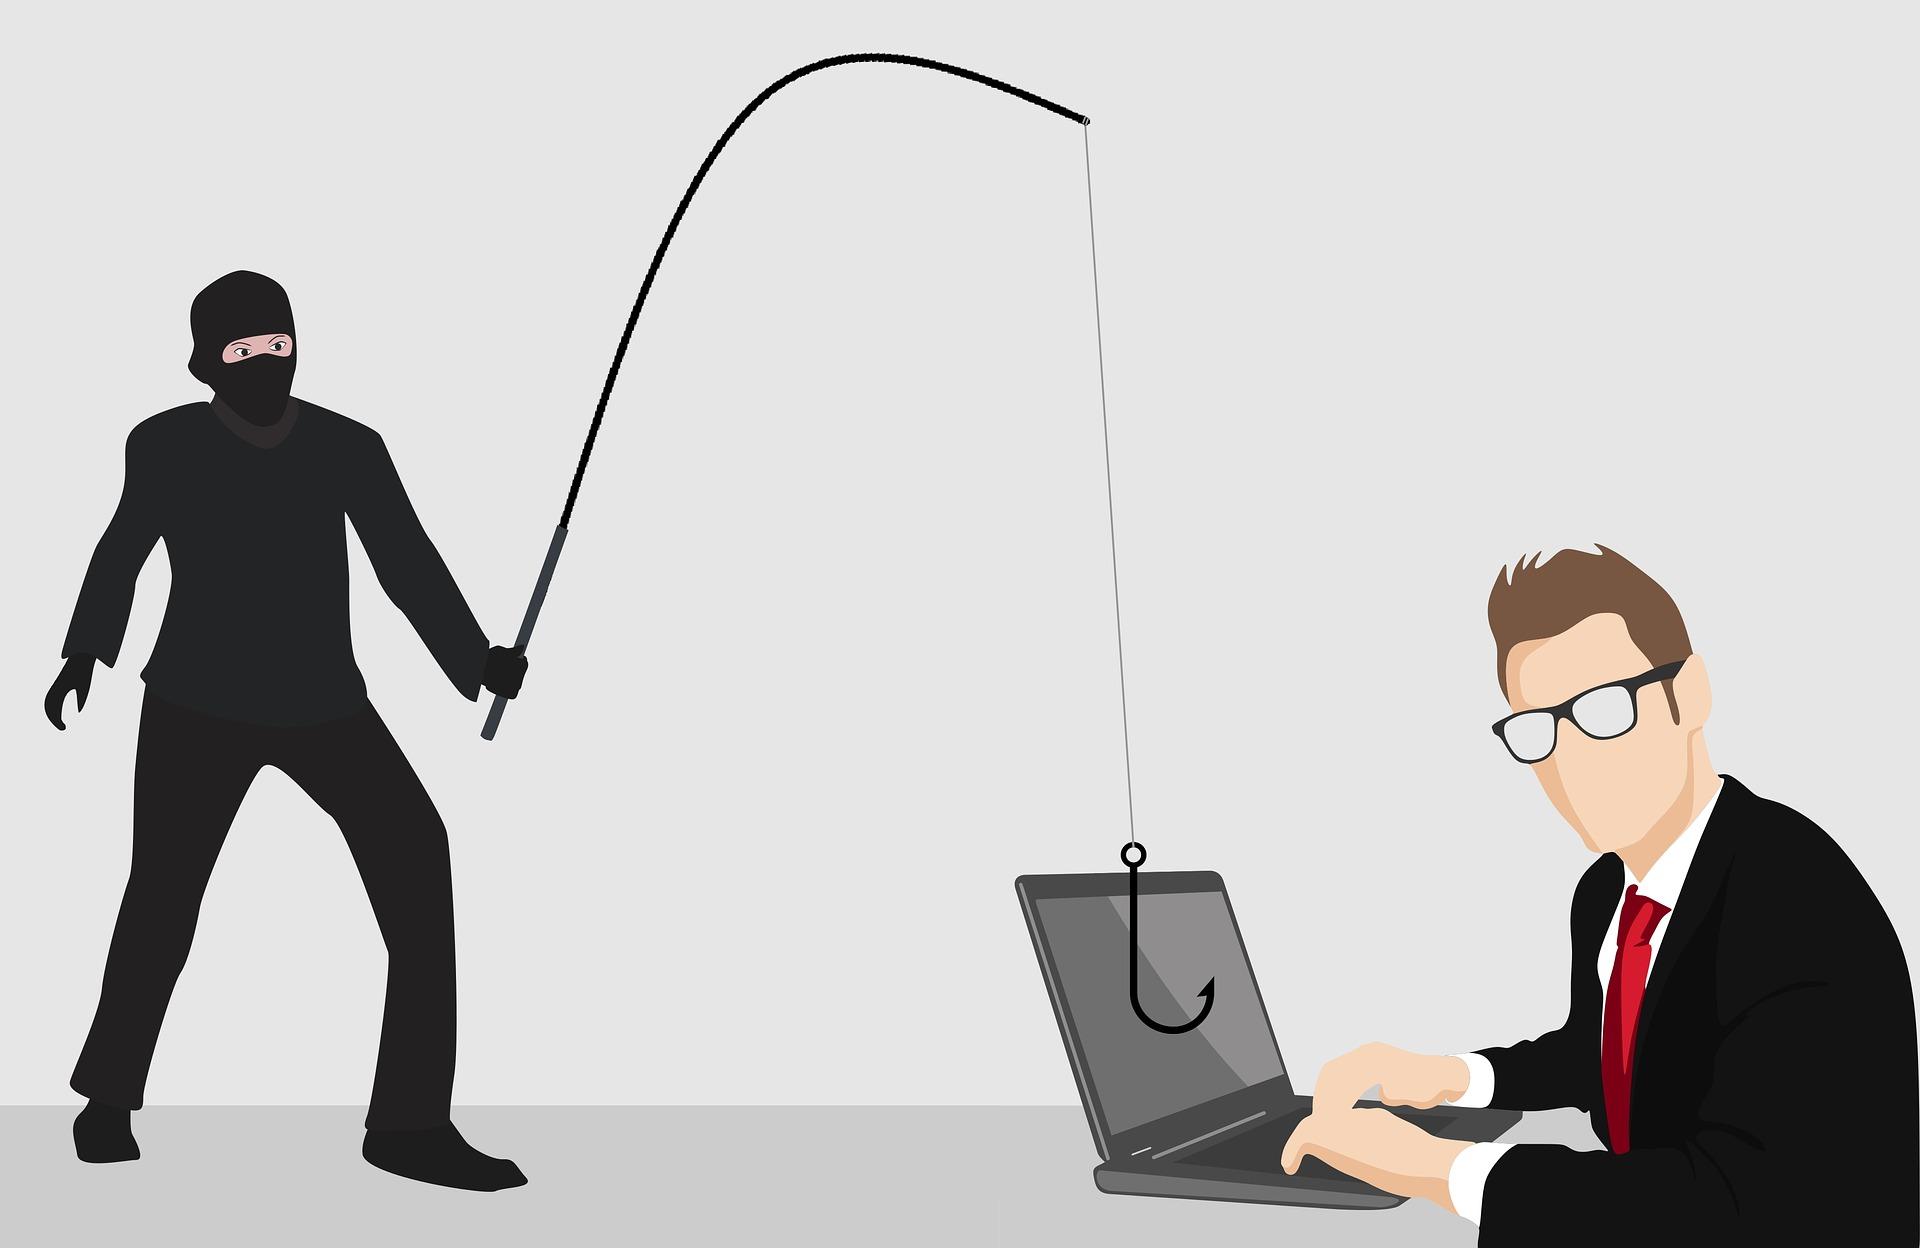 The Bank of America Invalid Logon Activities Alert Phishing Scam